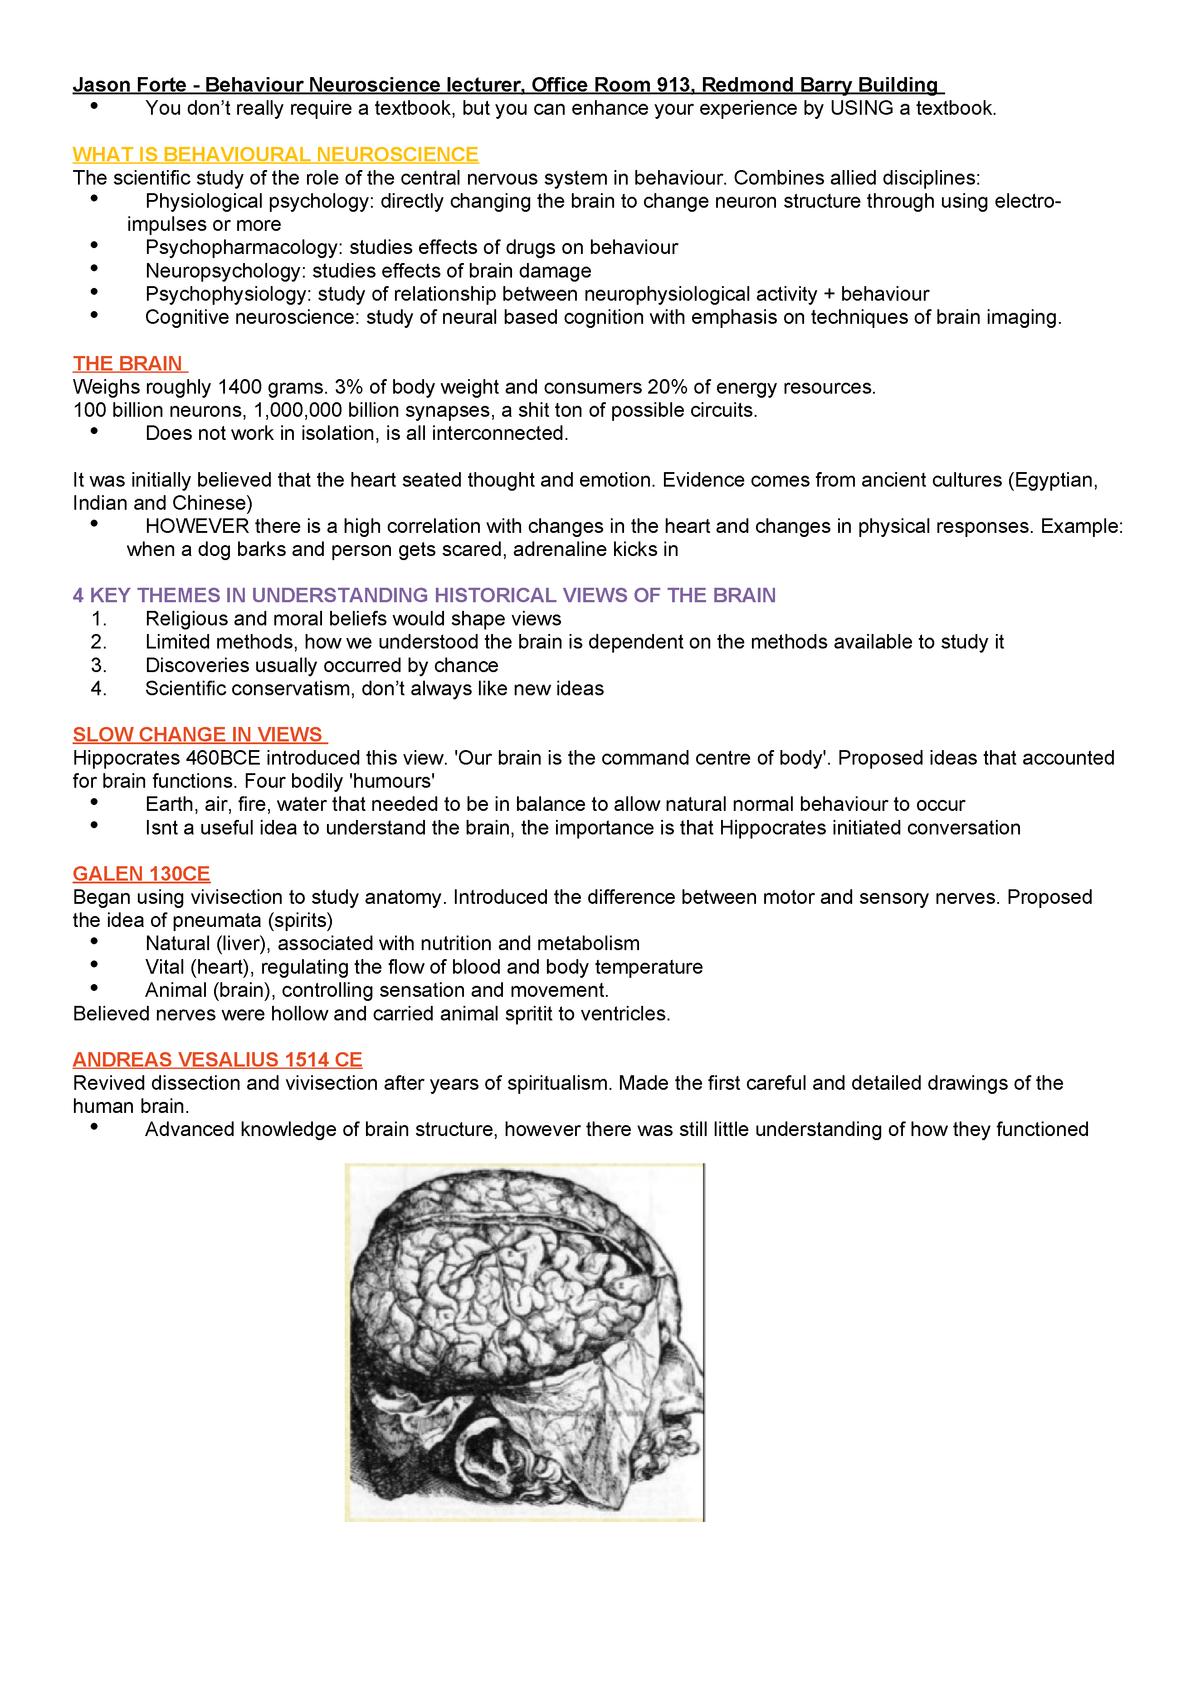 Biological nueroscience notes - PSYC10003 - Unimelb - StuDocu